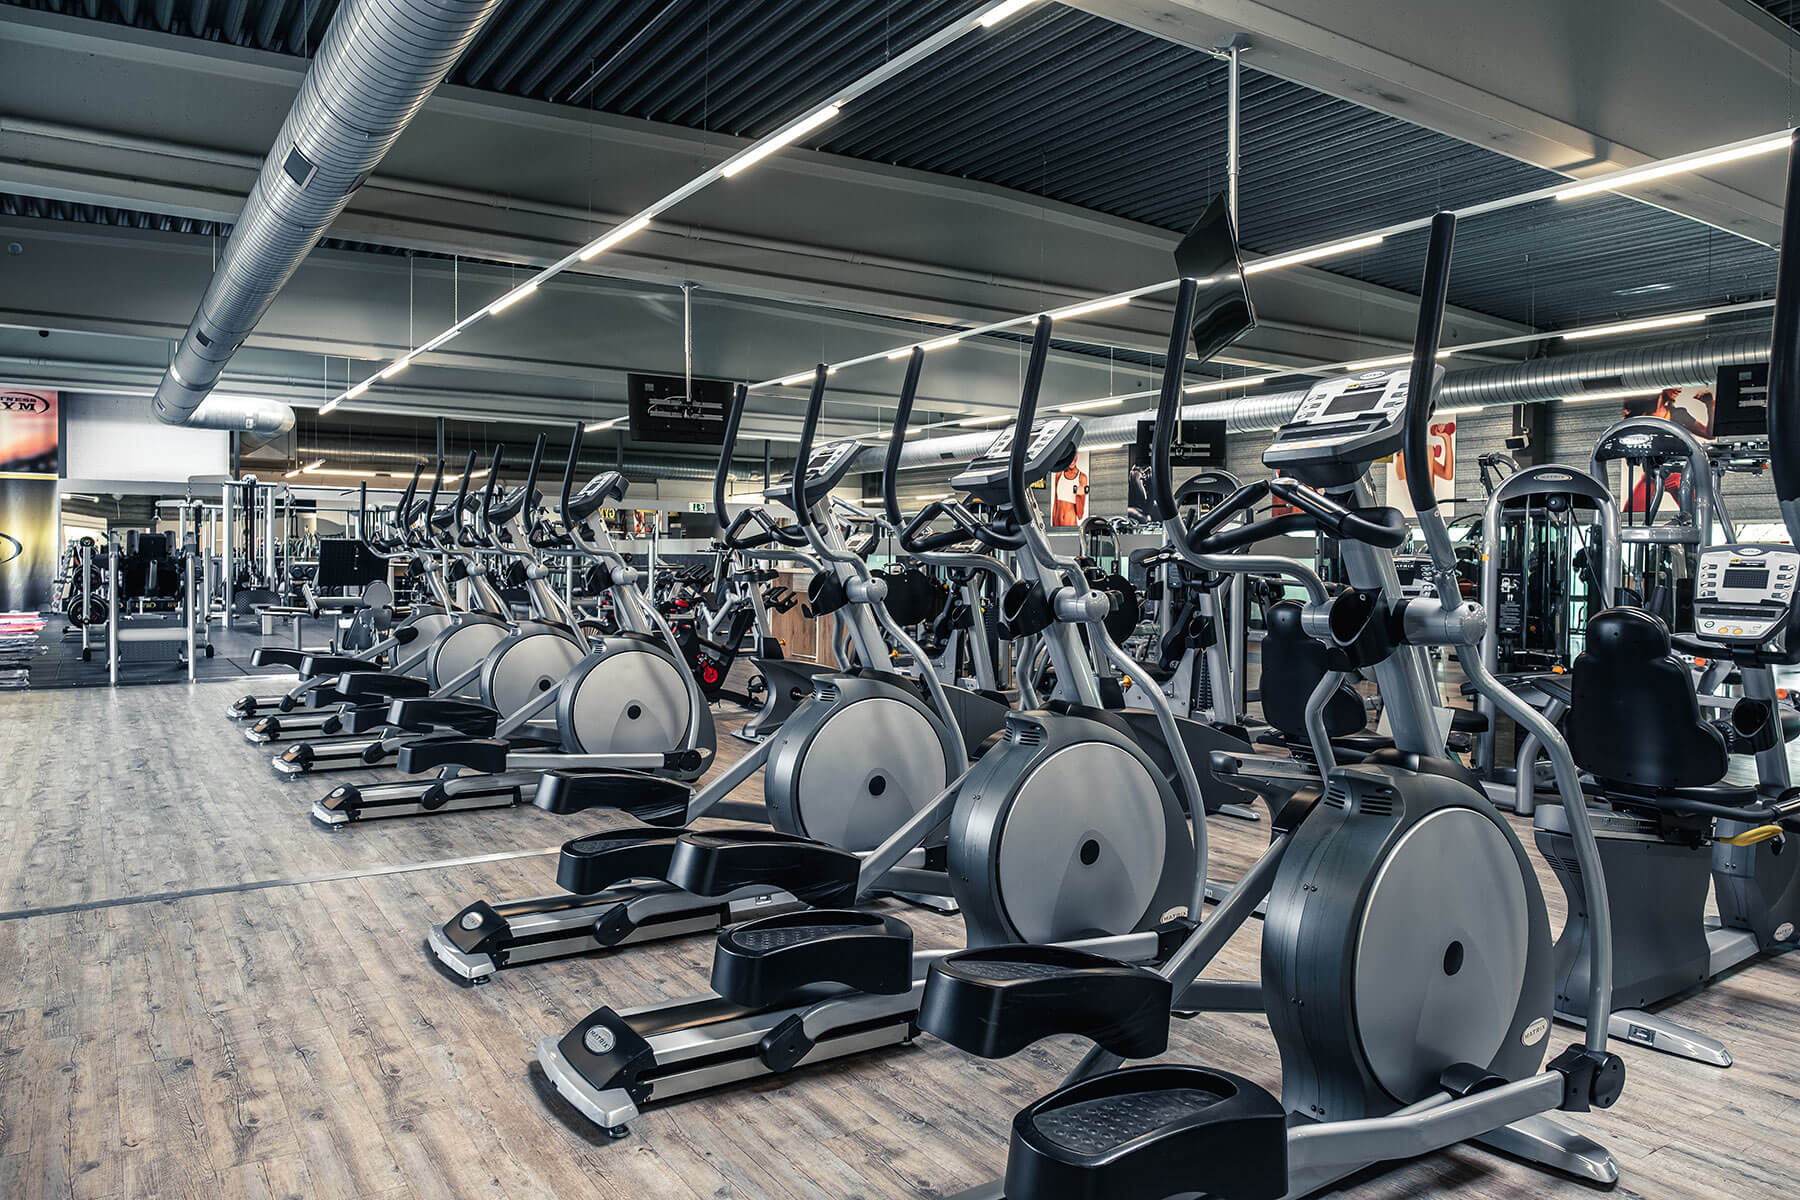 fitnessstudio hilden geräte cardio fitness gym